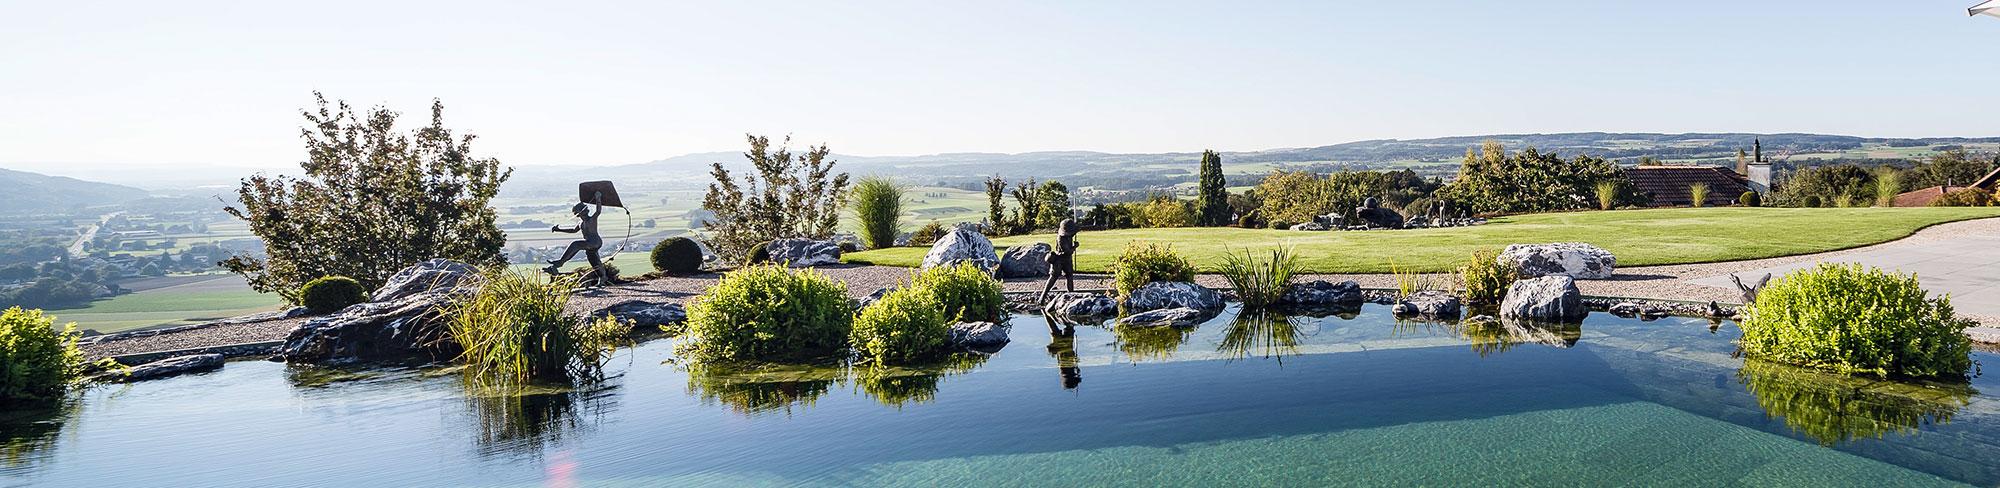 Gartengestaltung Erni Gartenbau